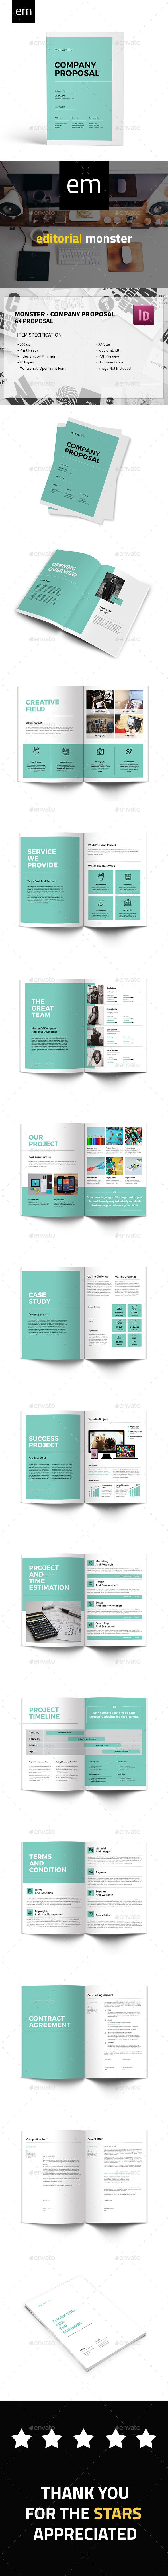 Monster  Company Proposal — InDesign INDD #brochure #layout • Download ➝ https://graphicriver.net/item/monster-company-proposal/20370207?ref=pxcr